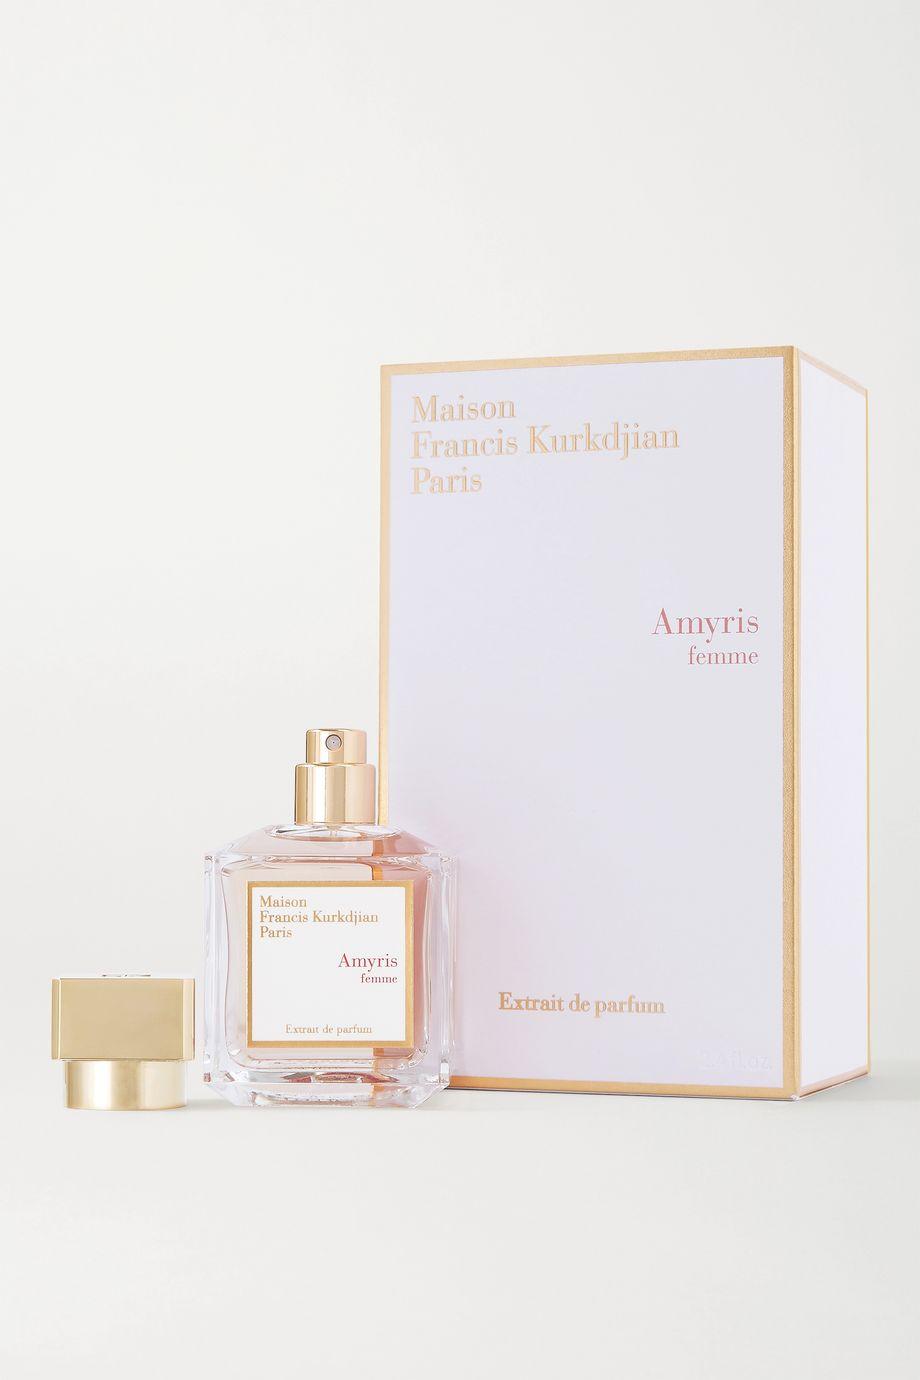 Maison Francis Kurkdjian Amyris Femme, 70 ml – Extrait de Parfum